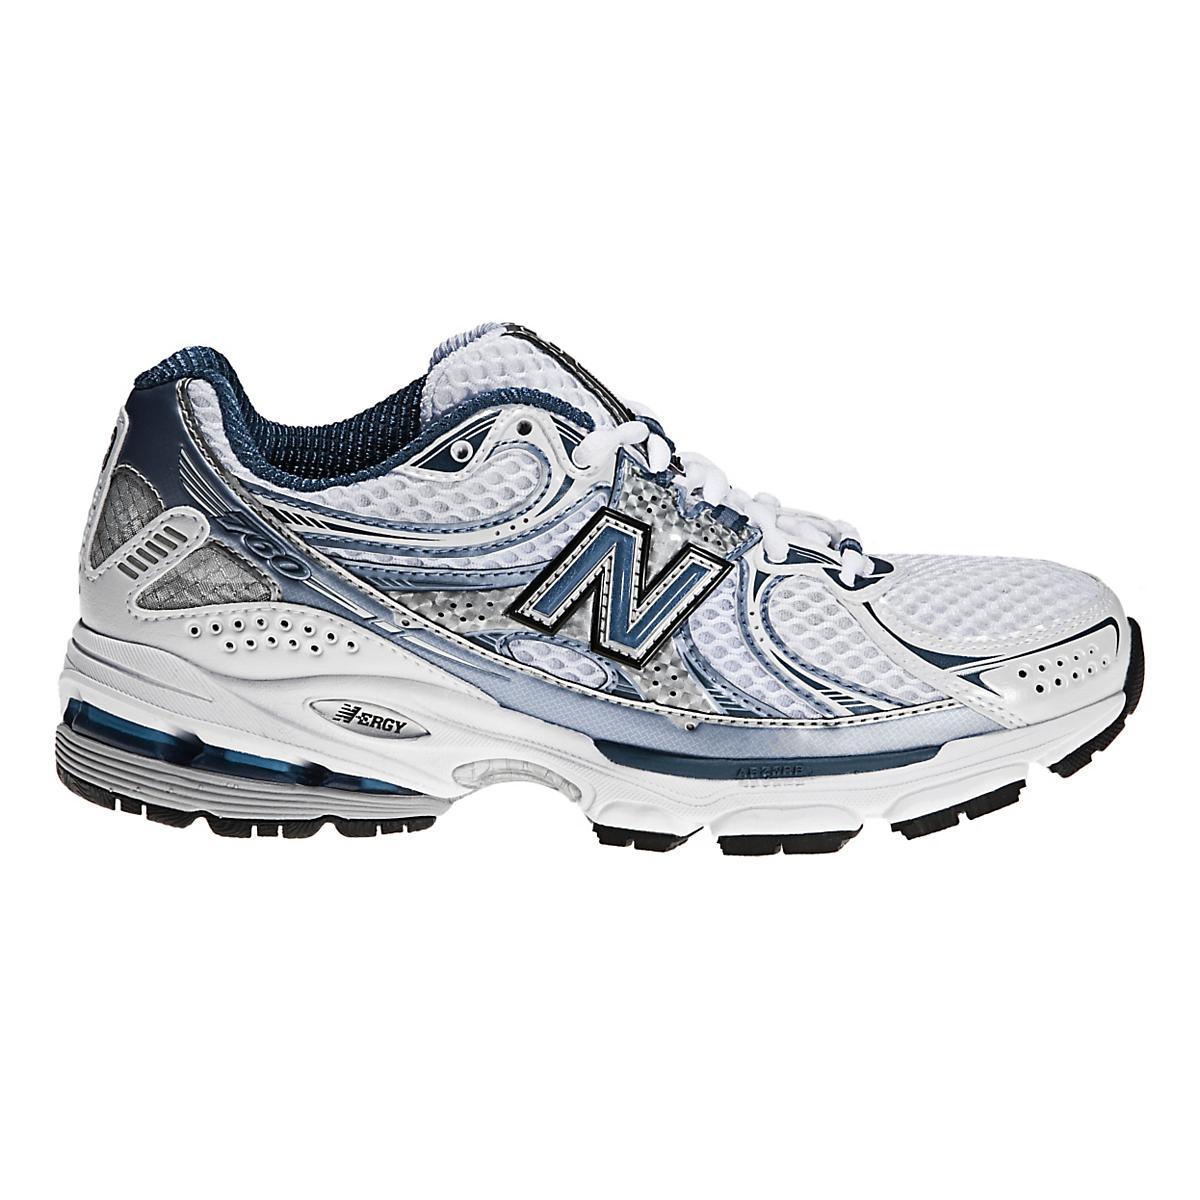 8cd7a9b872e0 Womens New Balance 760 Running Shoe at Road Runner Sports